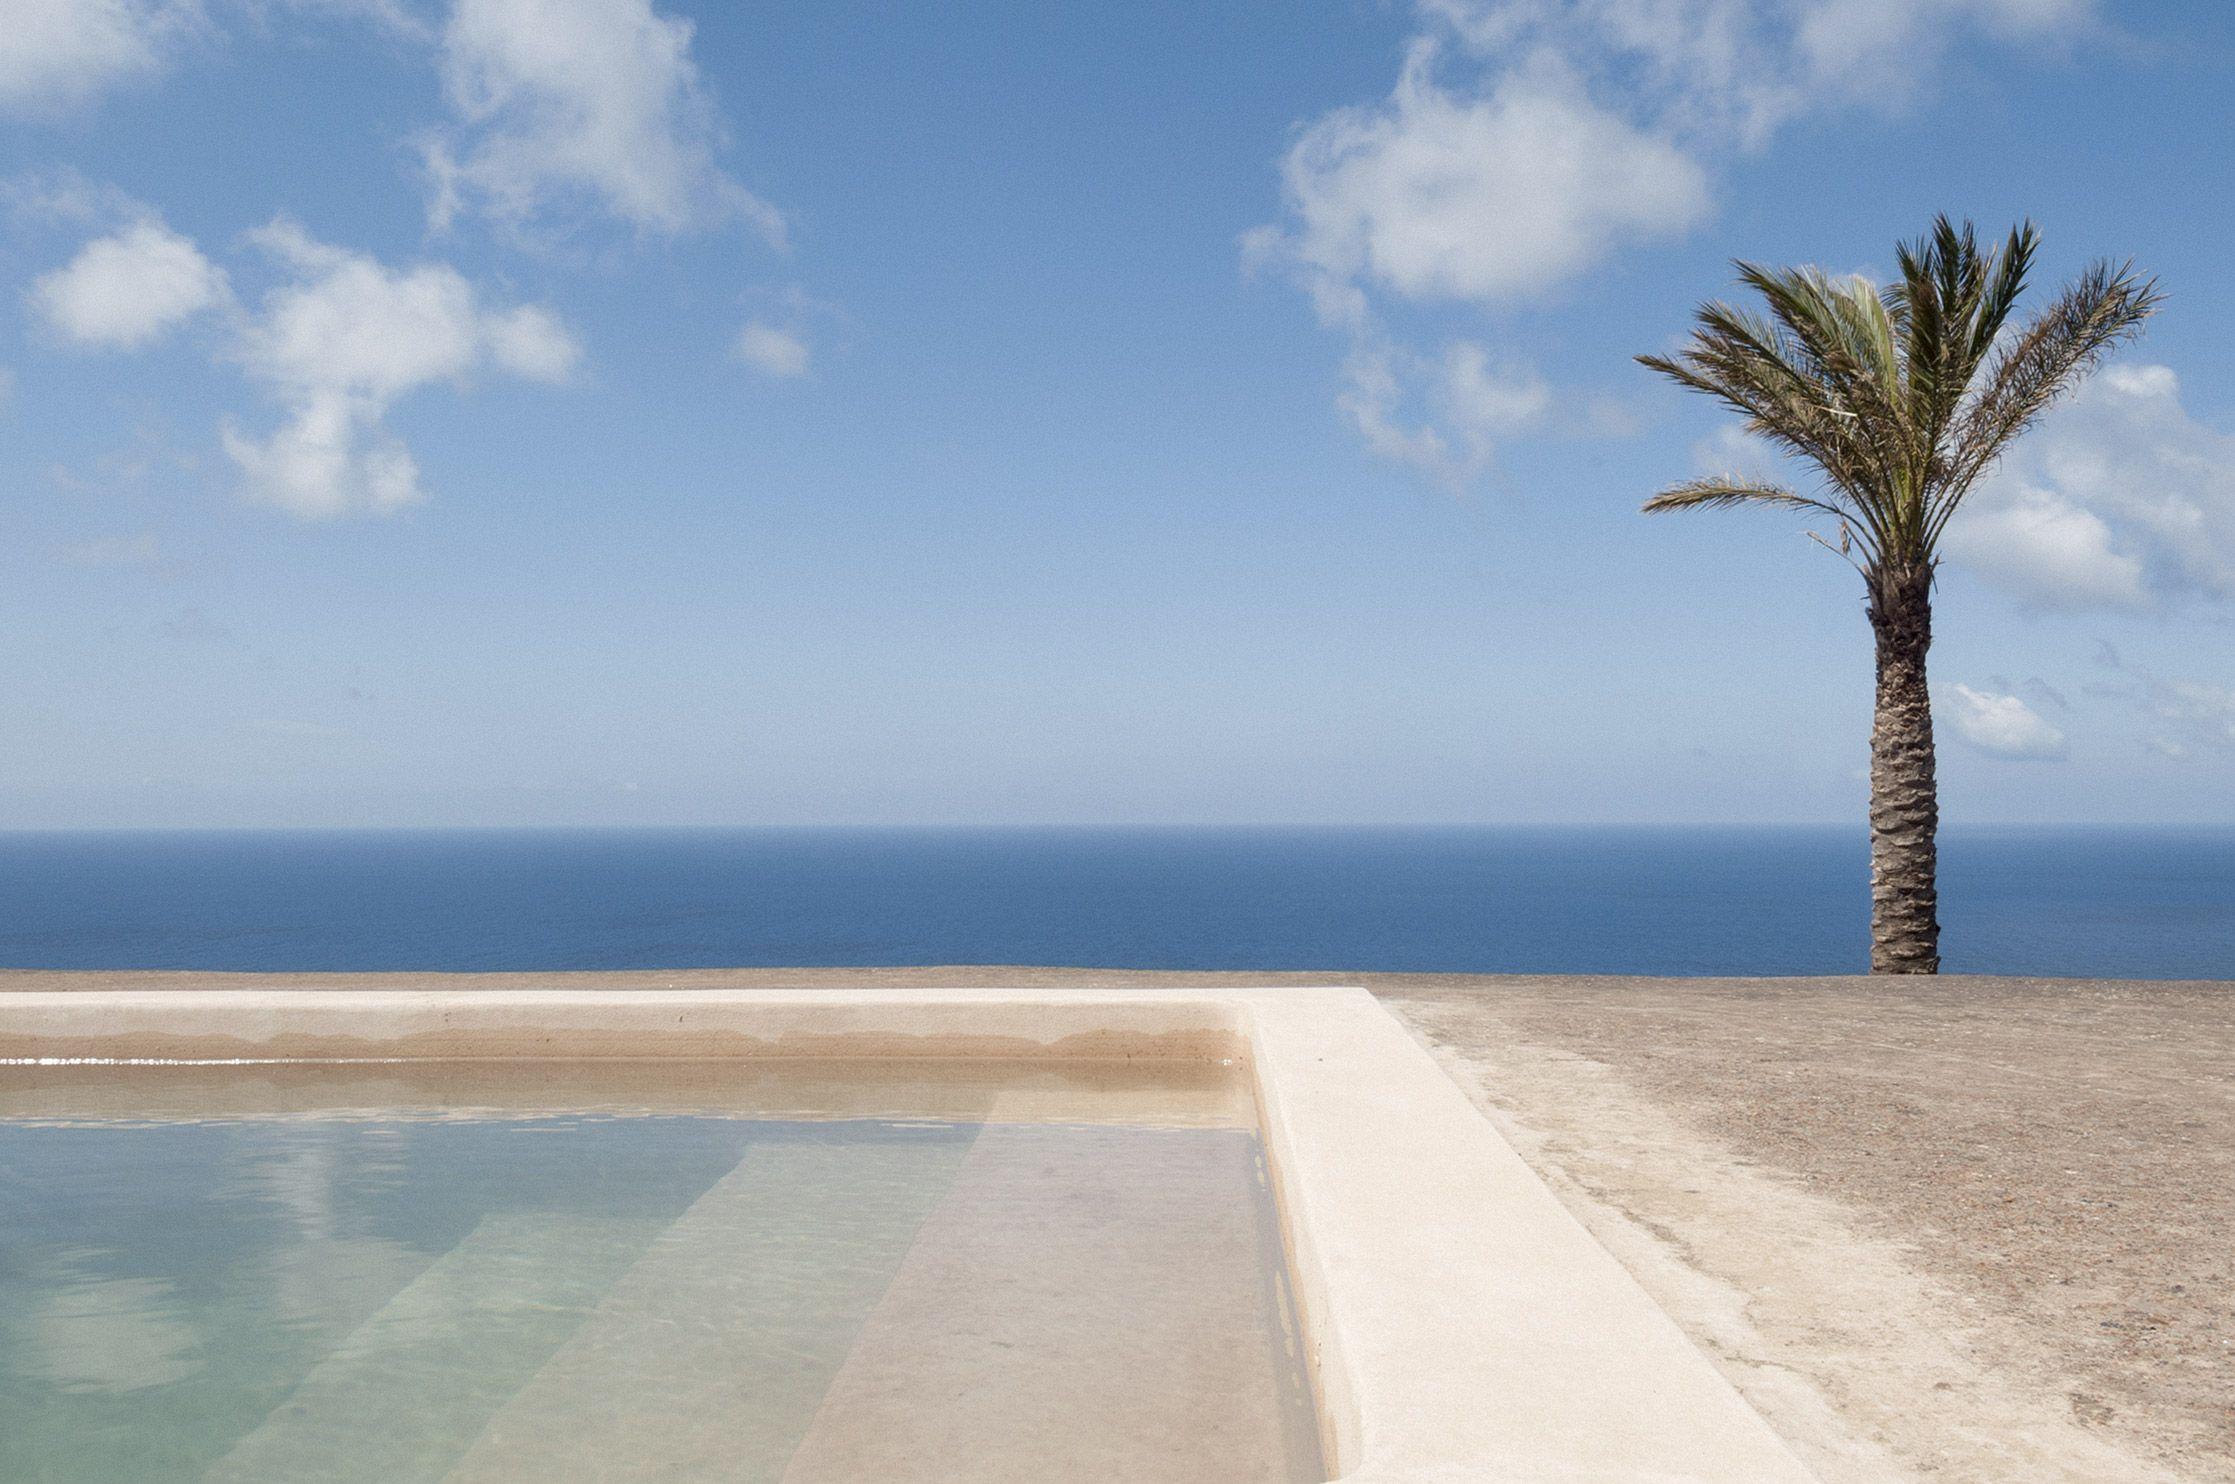 dammuso-pantelleria-antica-casa-nuova-1530519991.jpg